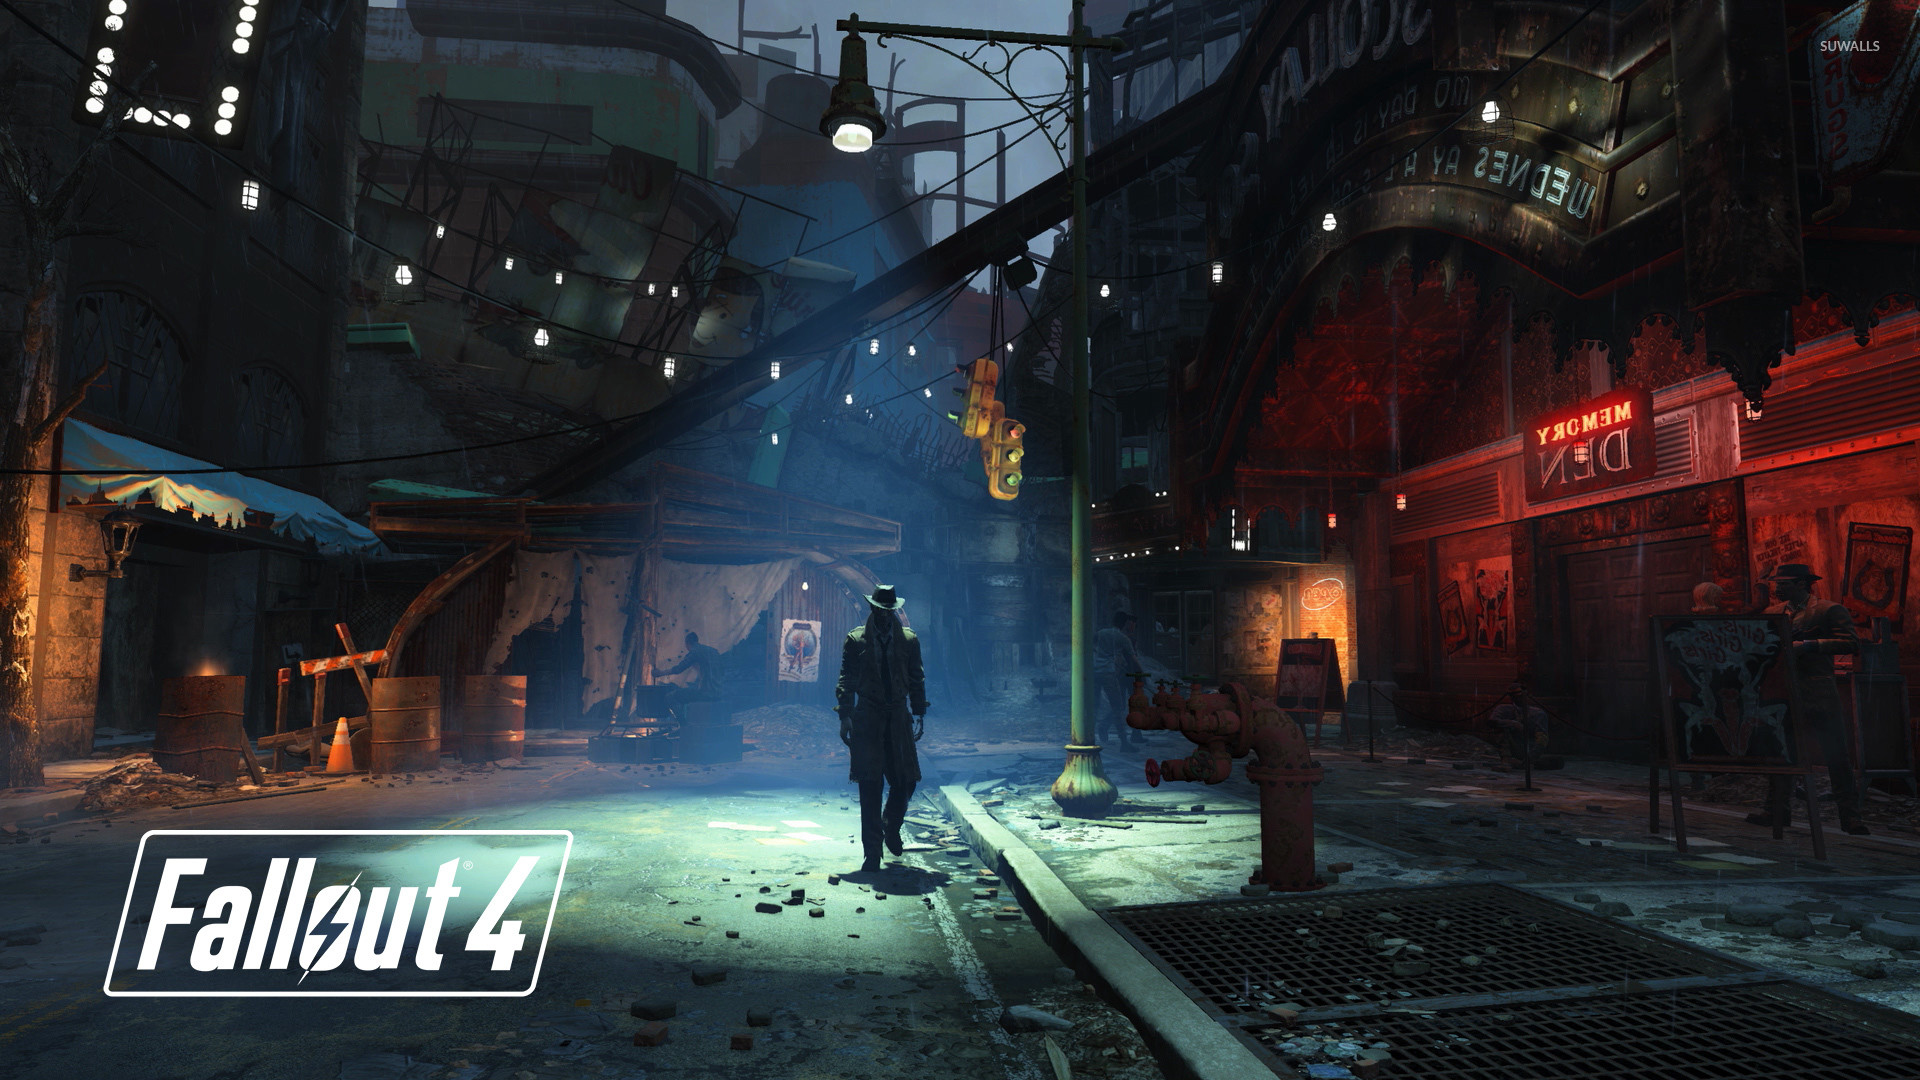 Fallout 3 Backgrounds – WallpaperSafari